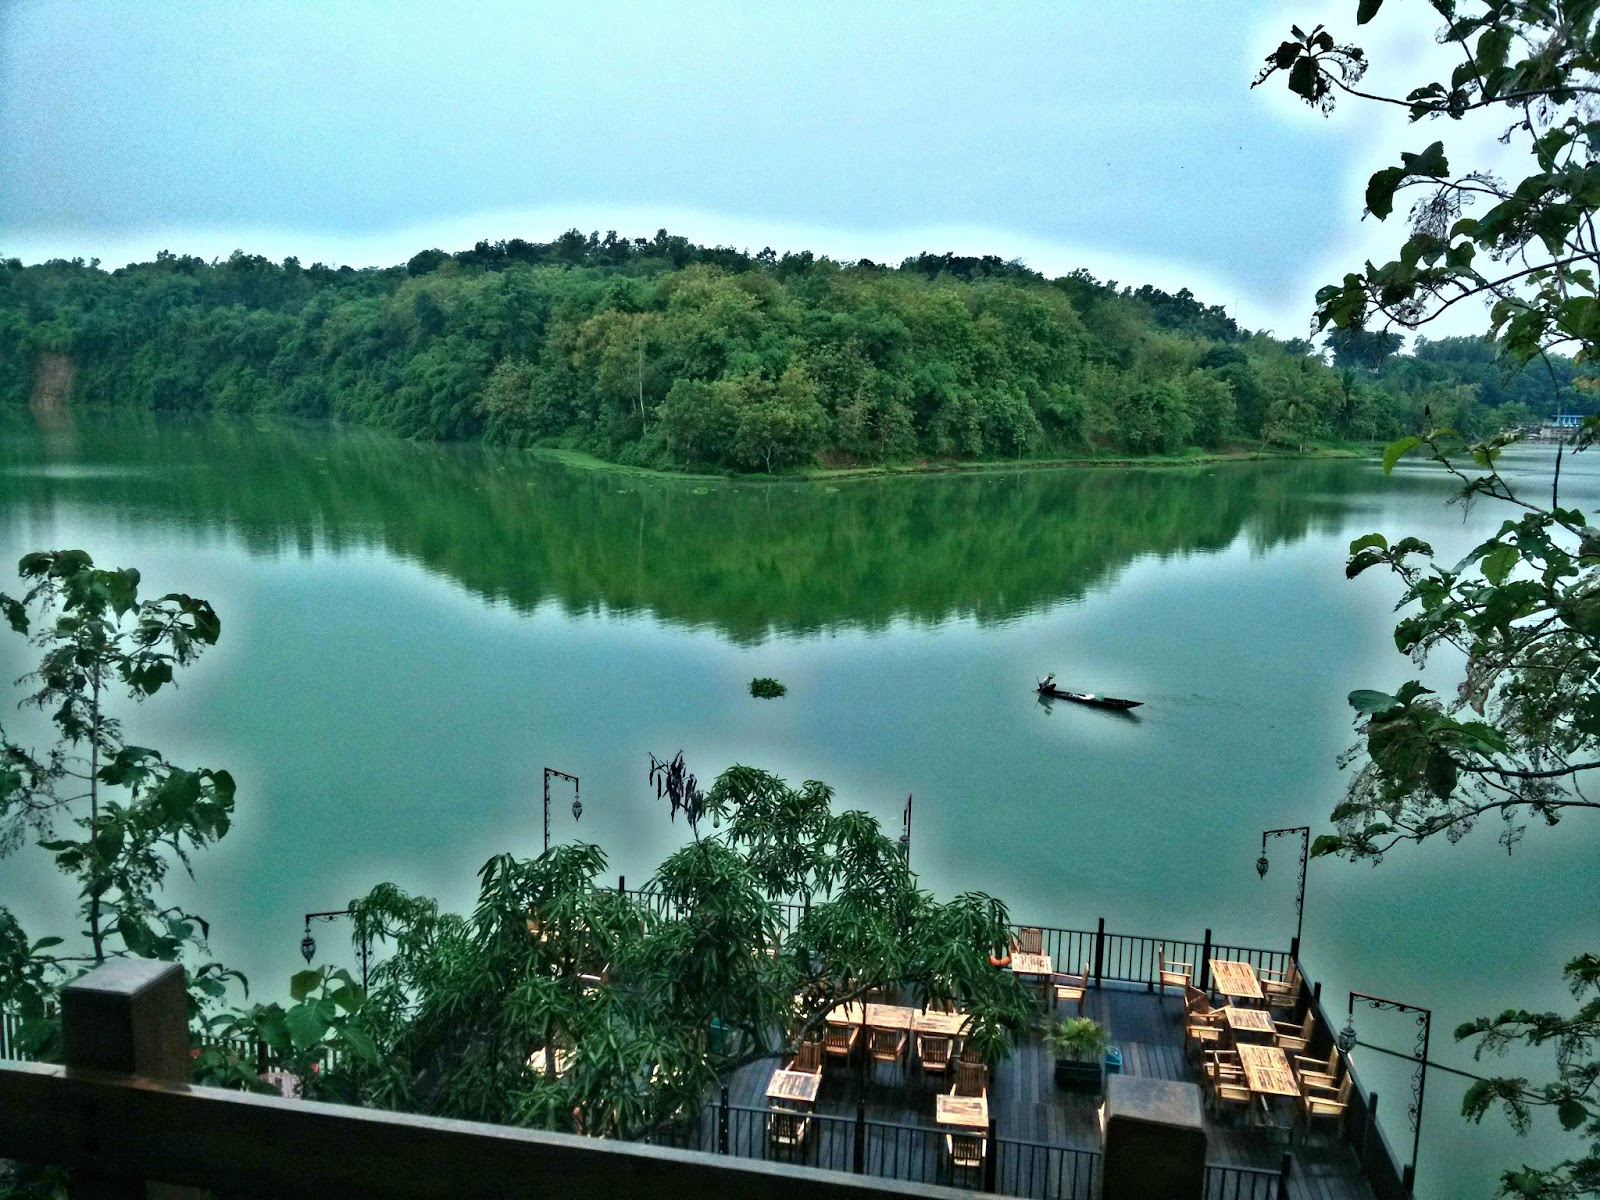 Objek Wisata Alam Kebumen Jawa Tengah Wajib Dikunjungi Tempat Jembangan